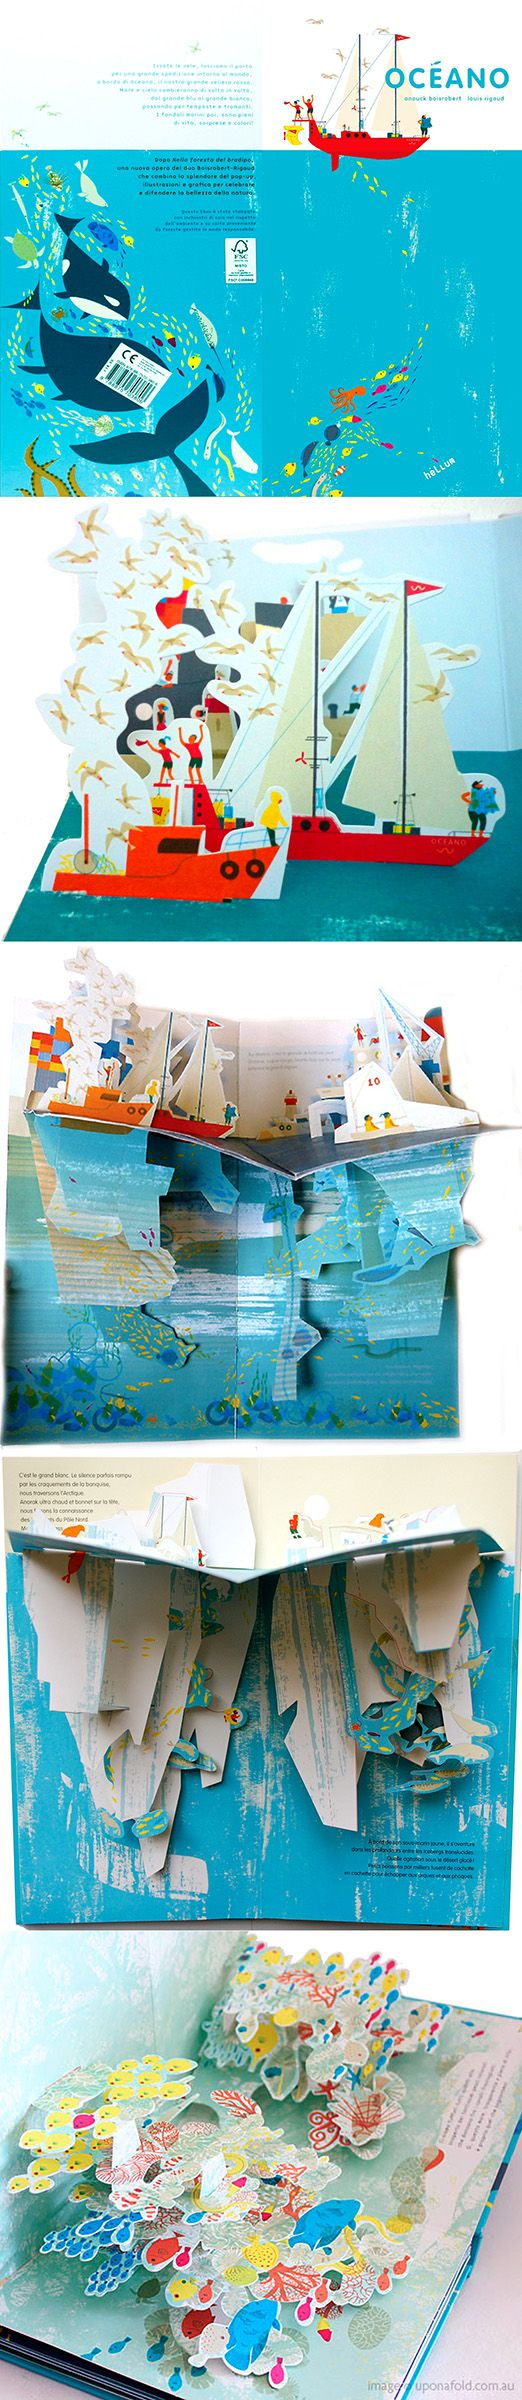 OCEANO POP-UP BOOK  |  by Anouck Boisrobert and Louis Rigaud;  London: Tate…